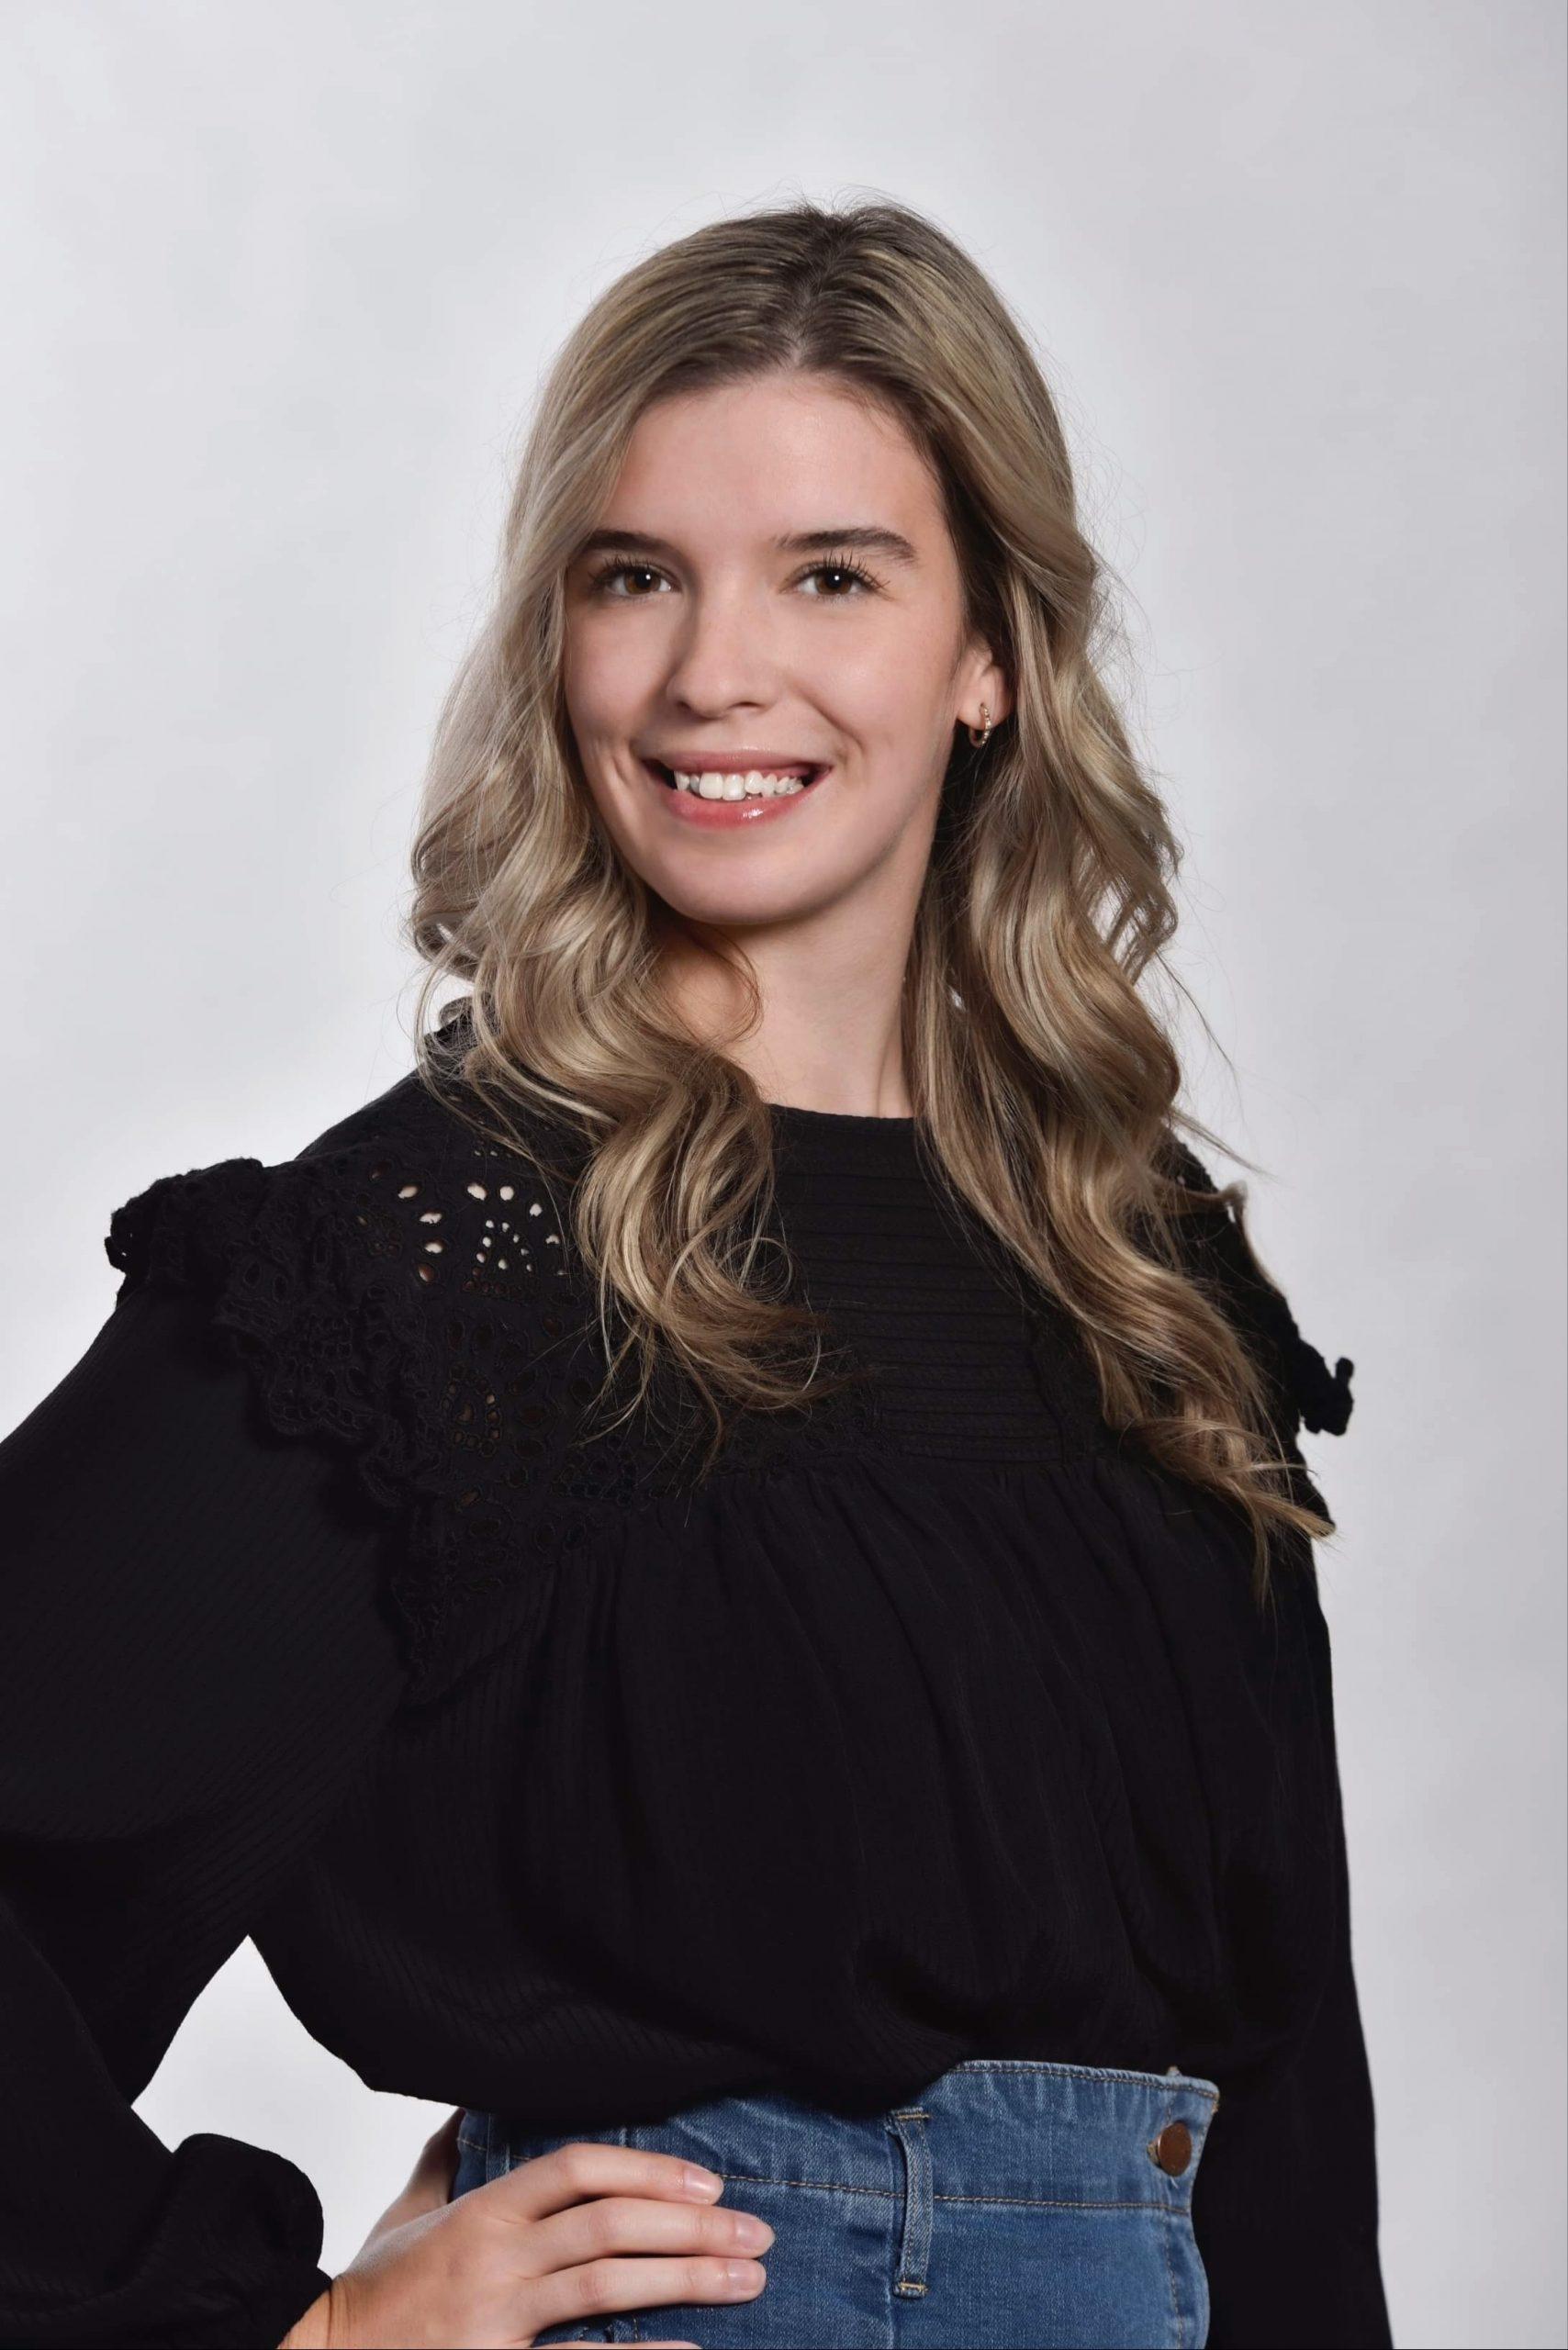 Marie-Pier Ayotte